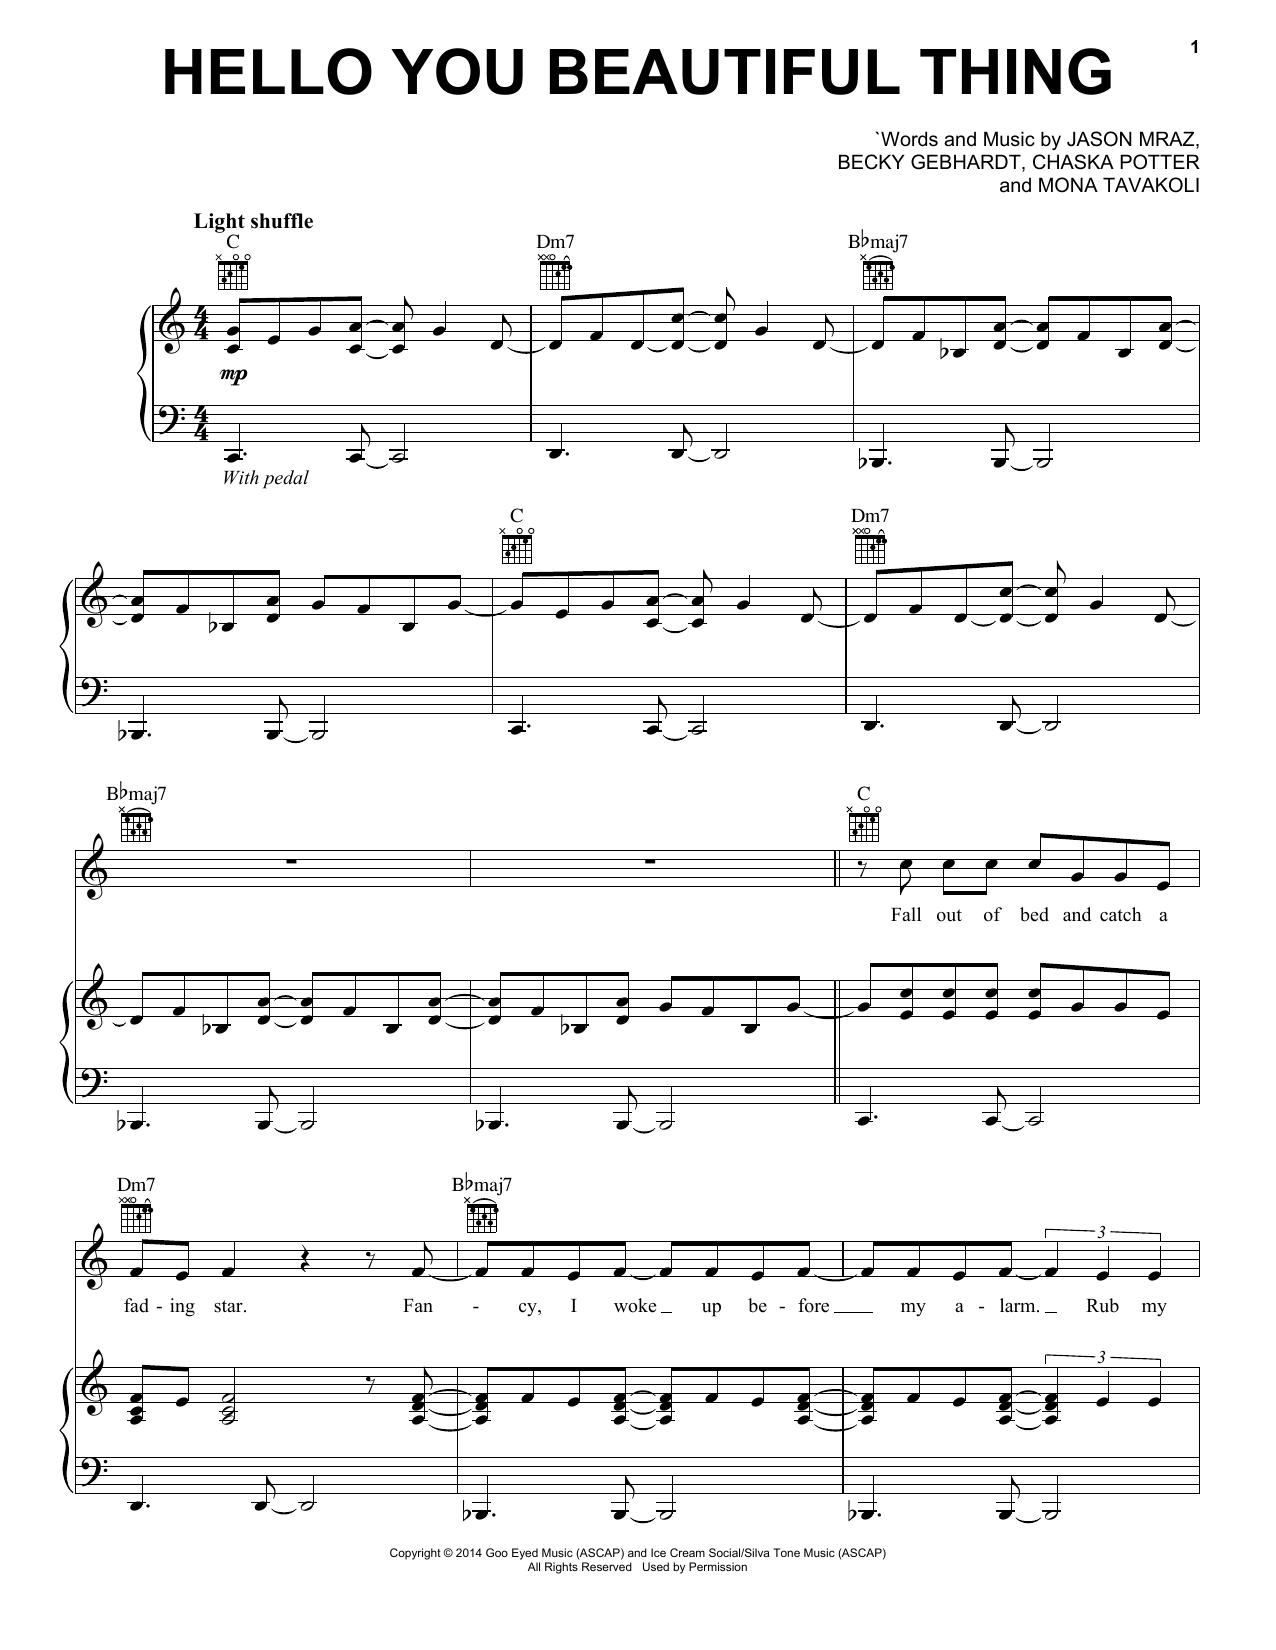 Jason Mraz Hello You Beautiful Thing sheet music notes and chords. Download Printable PDF.